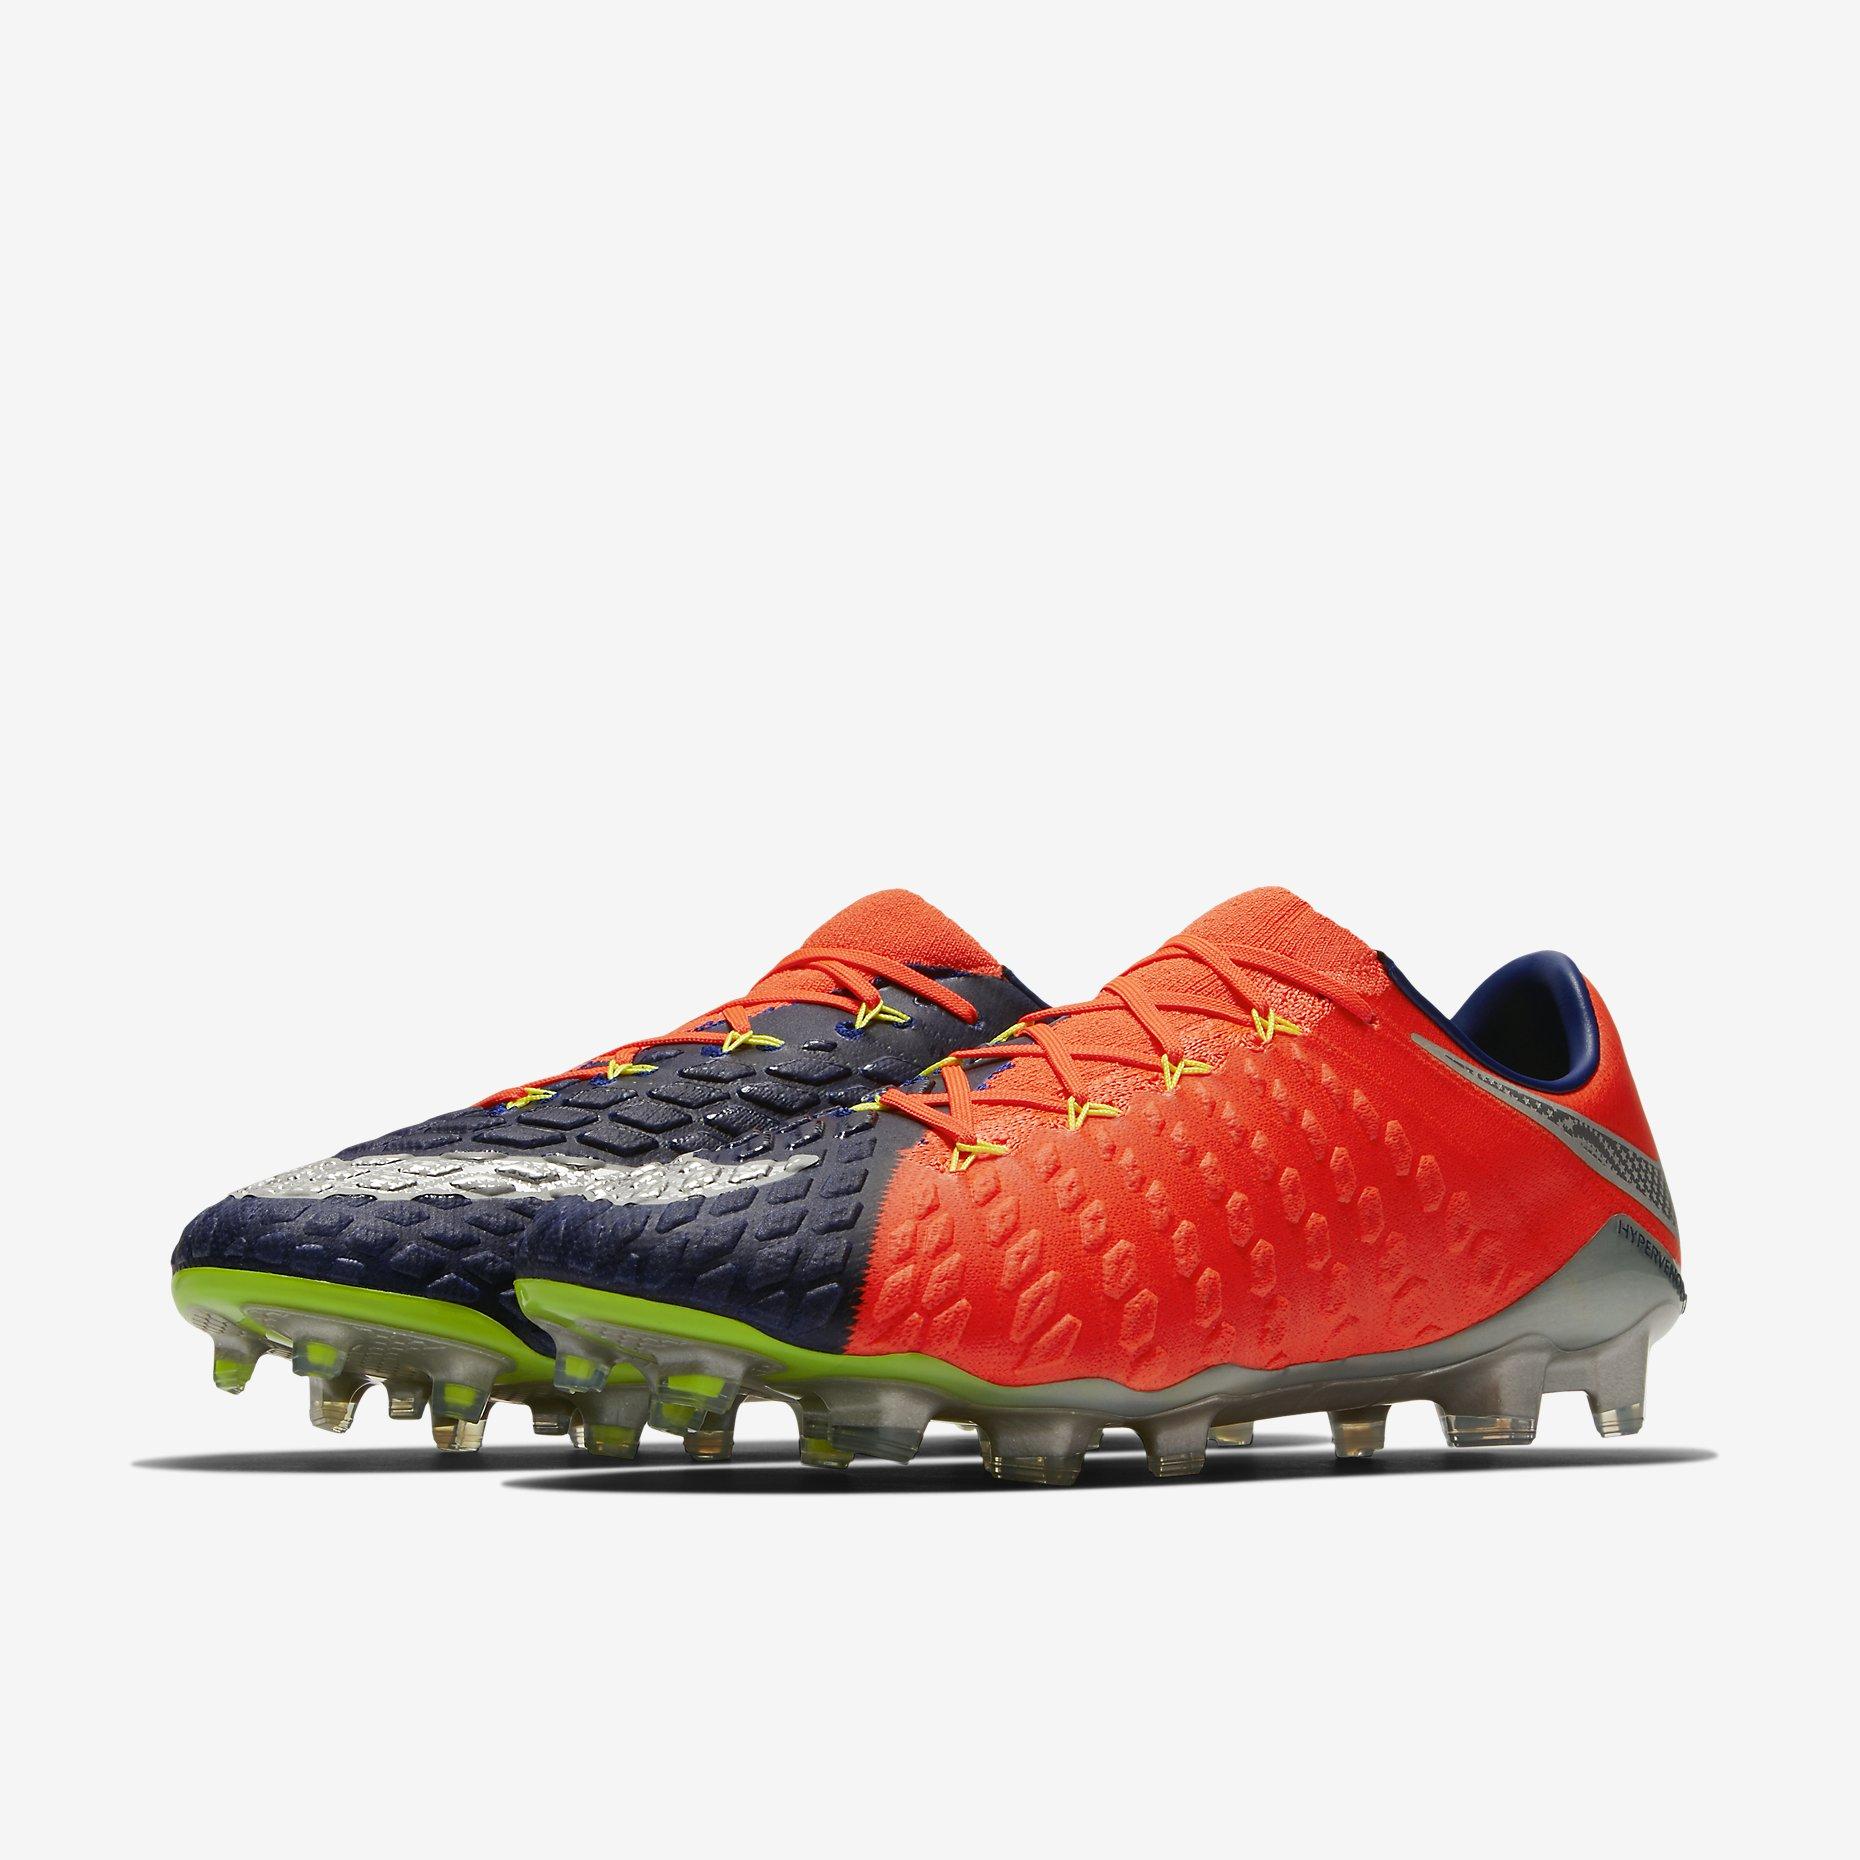 1edf2d45b Nike Hypervenom Phantom 3 FG Time To Shine - Deep Royal Blue / Total Crimson  / Bright Citrus / Chrome